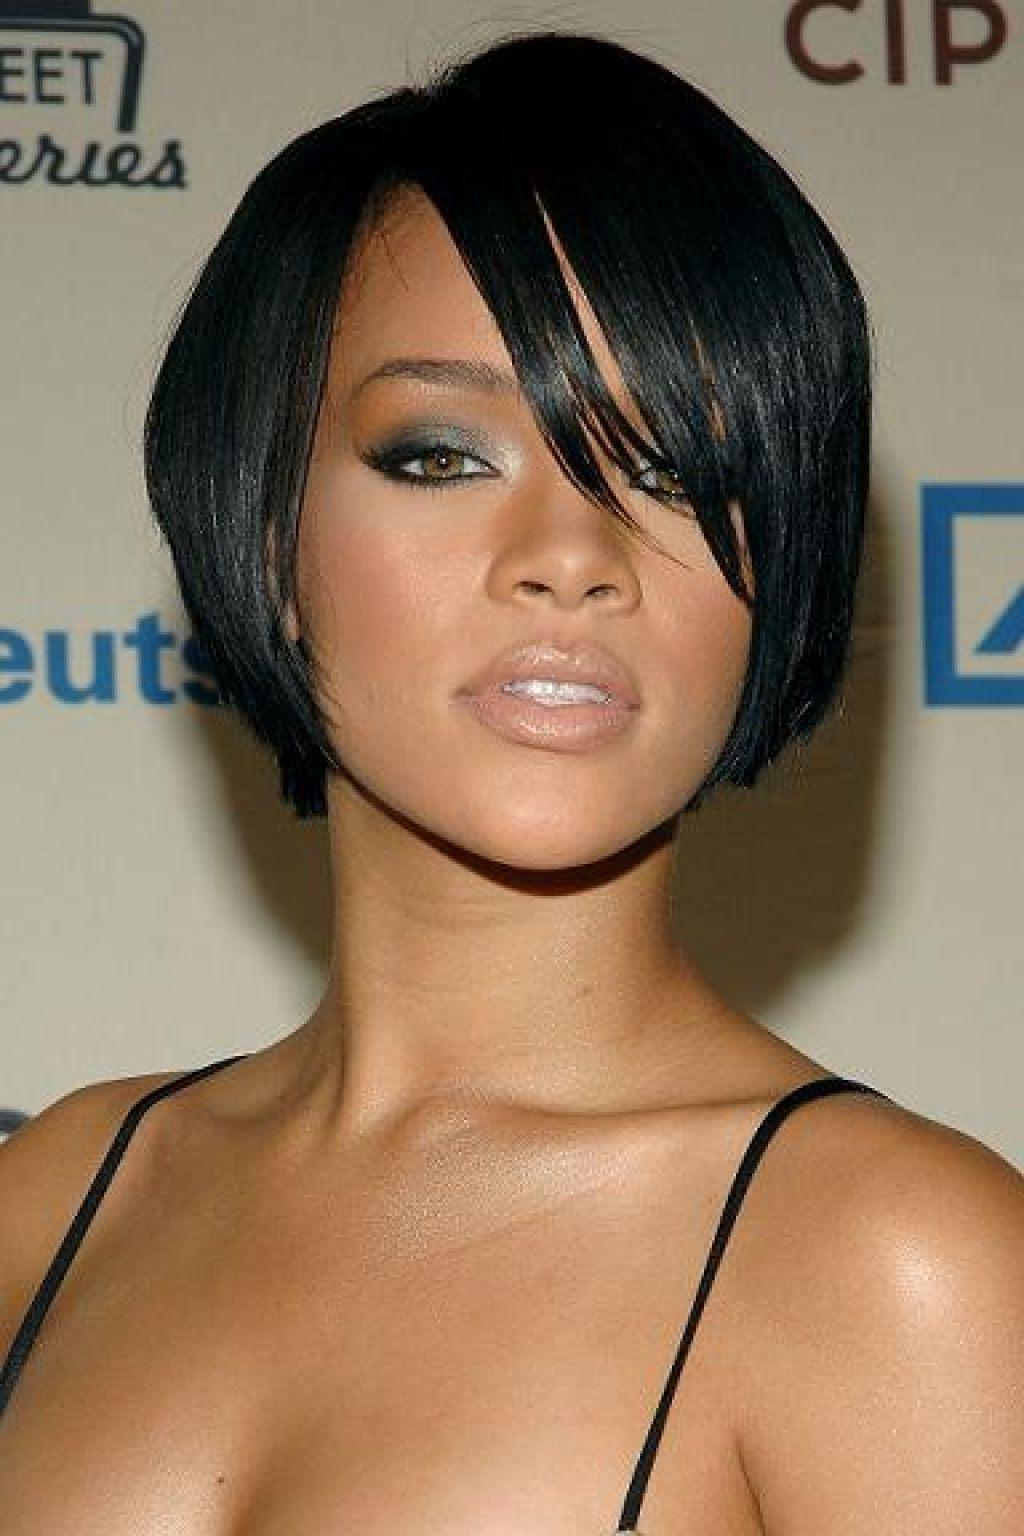 Layered Bob Hairstyles Black Women Women Medium Haircut Black Hair Pertaining To Bob Short Hairstyles For Black Women (View 17 of 25)